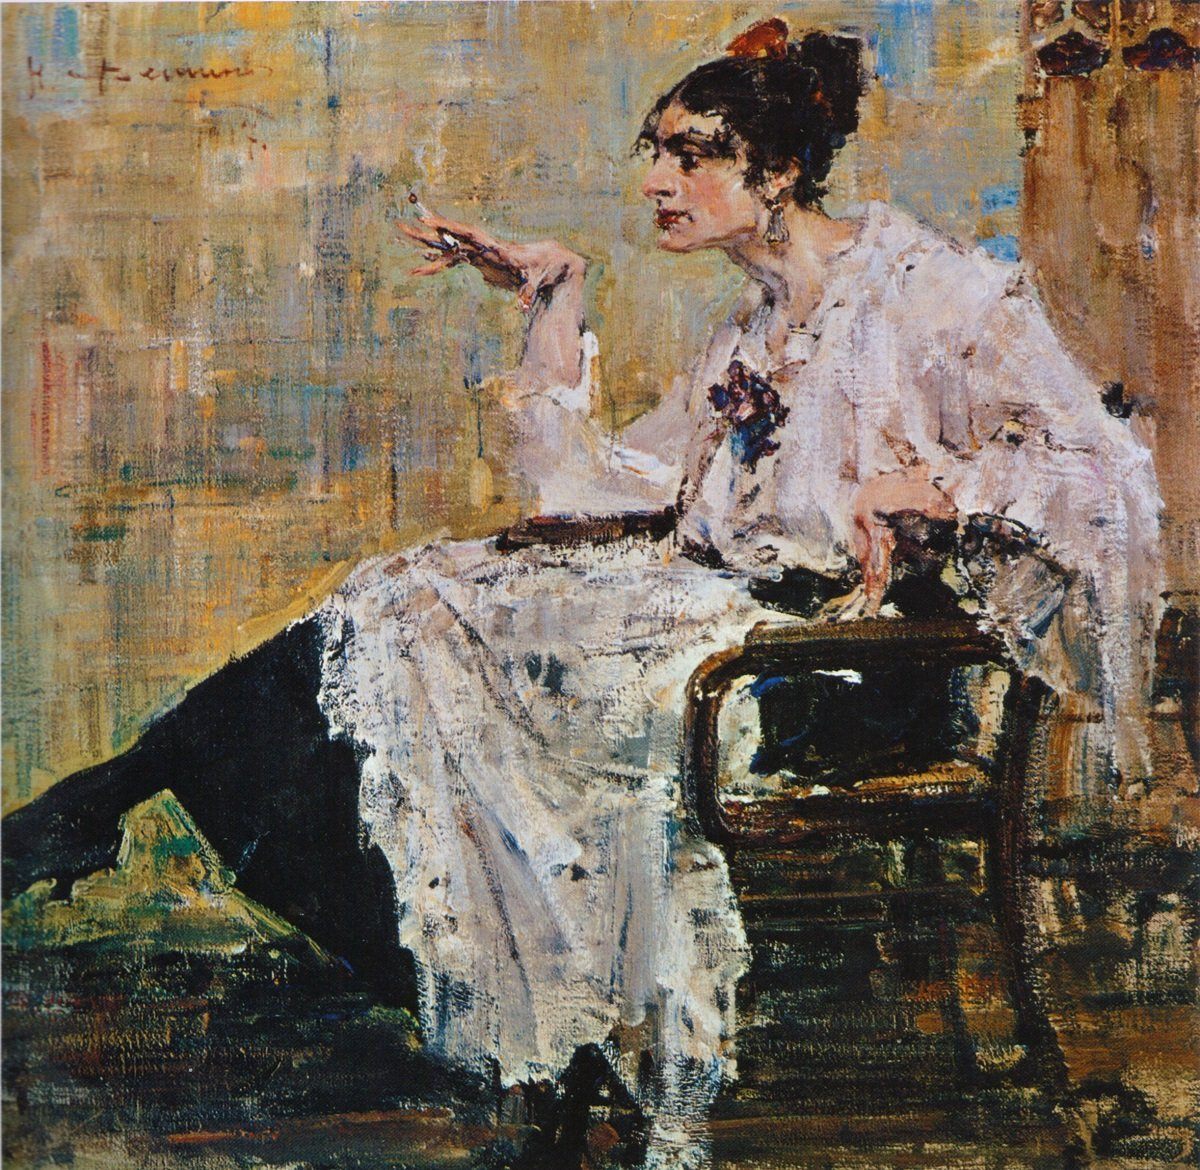 Atiby - ЖЕНЩИНА С СИГАРЕТОЙ (1917)